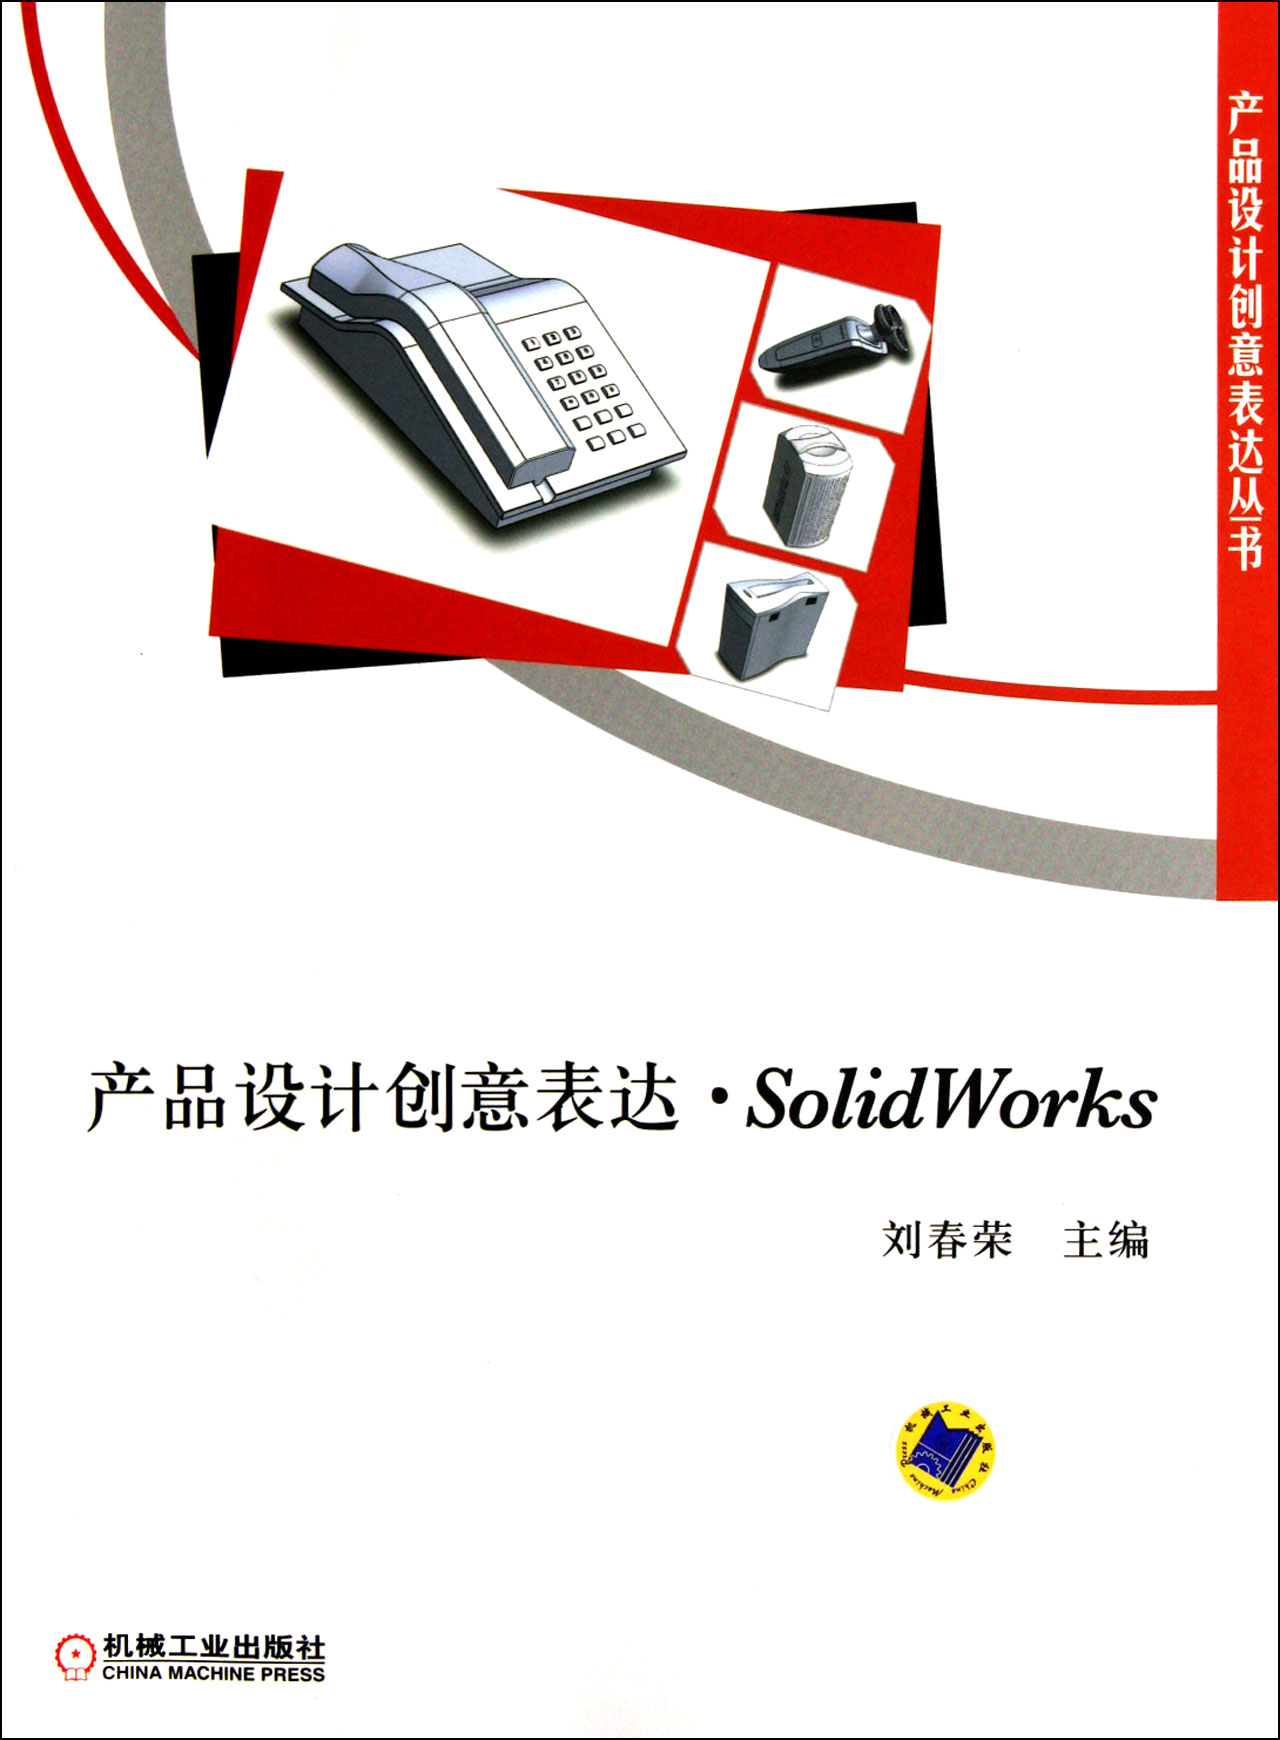 产品设计创意表达(solidworks)